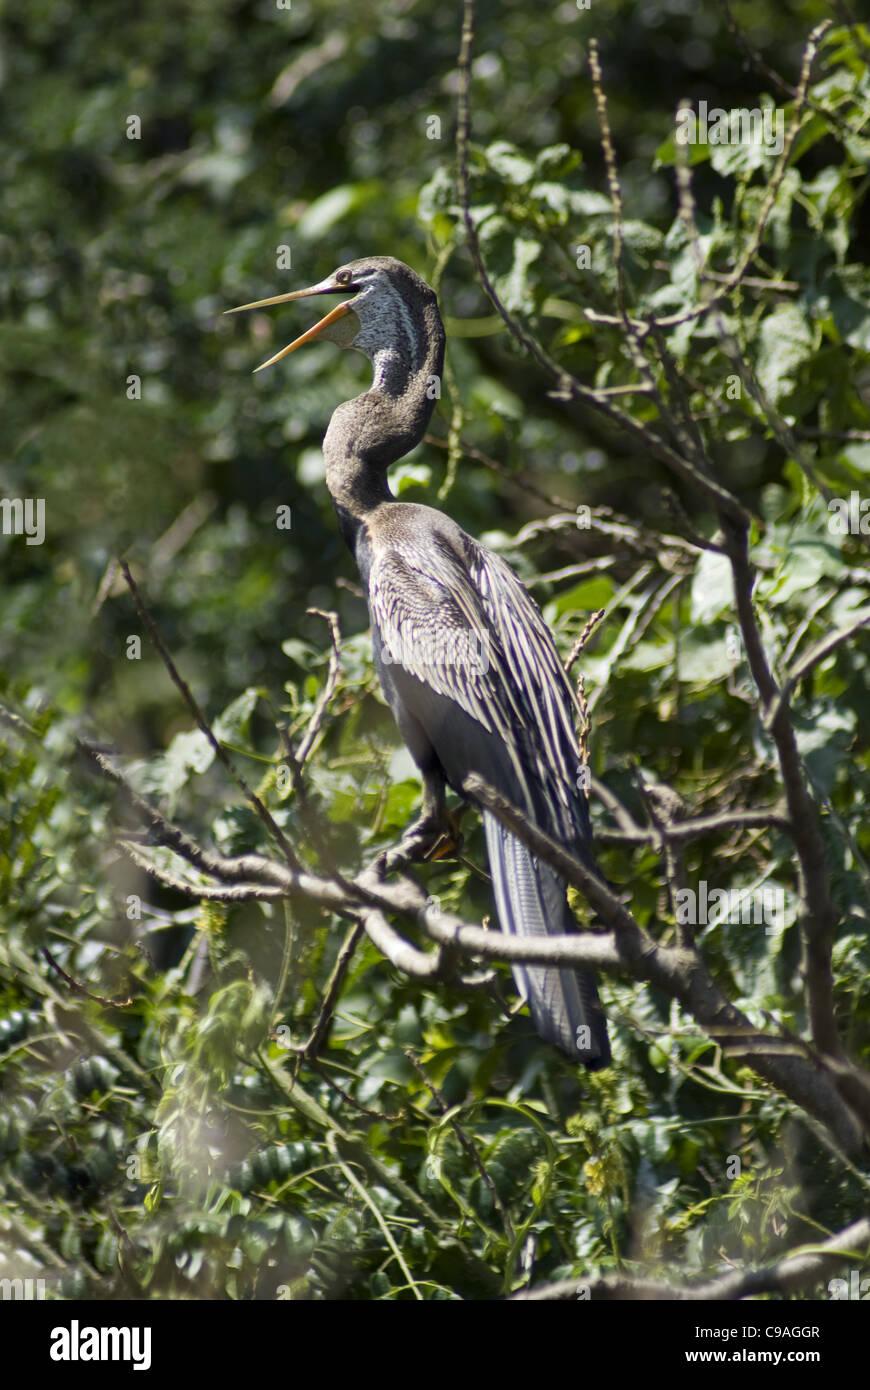 Oriental Darter at Ranganathittu Bird Sanctuary, Mysore - Stock Image